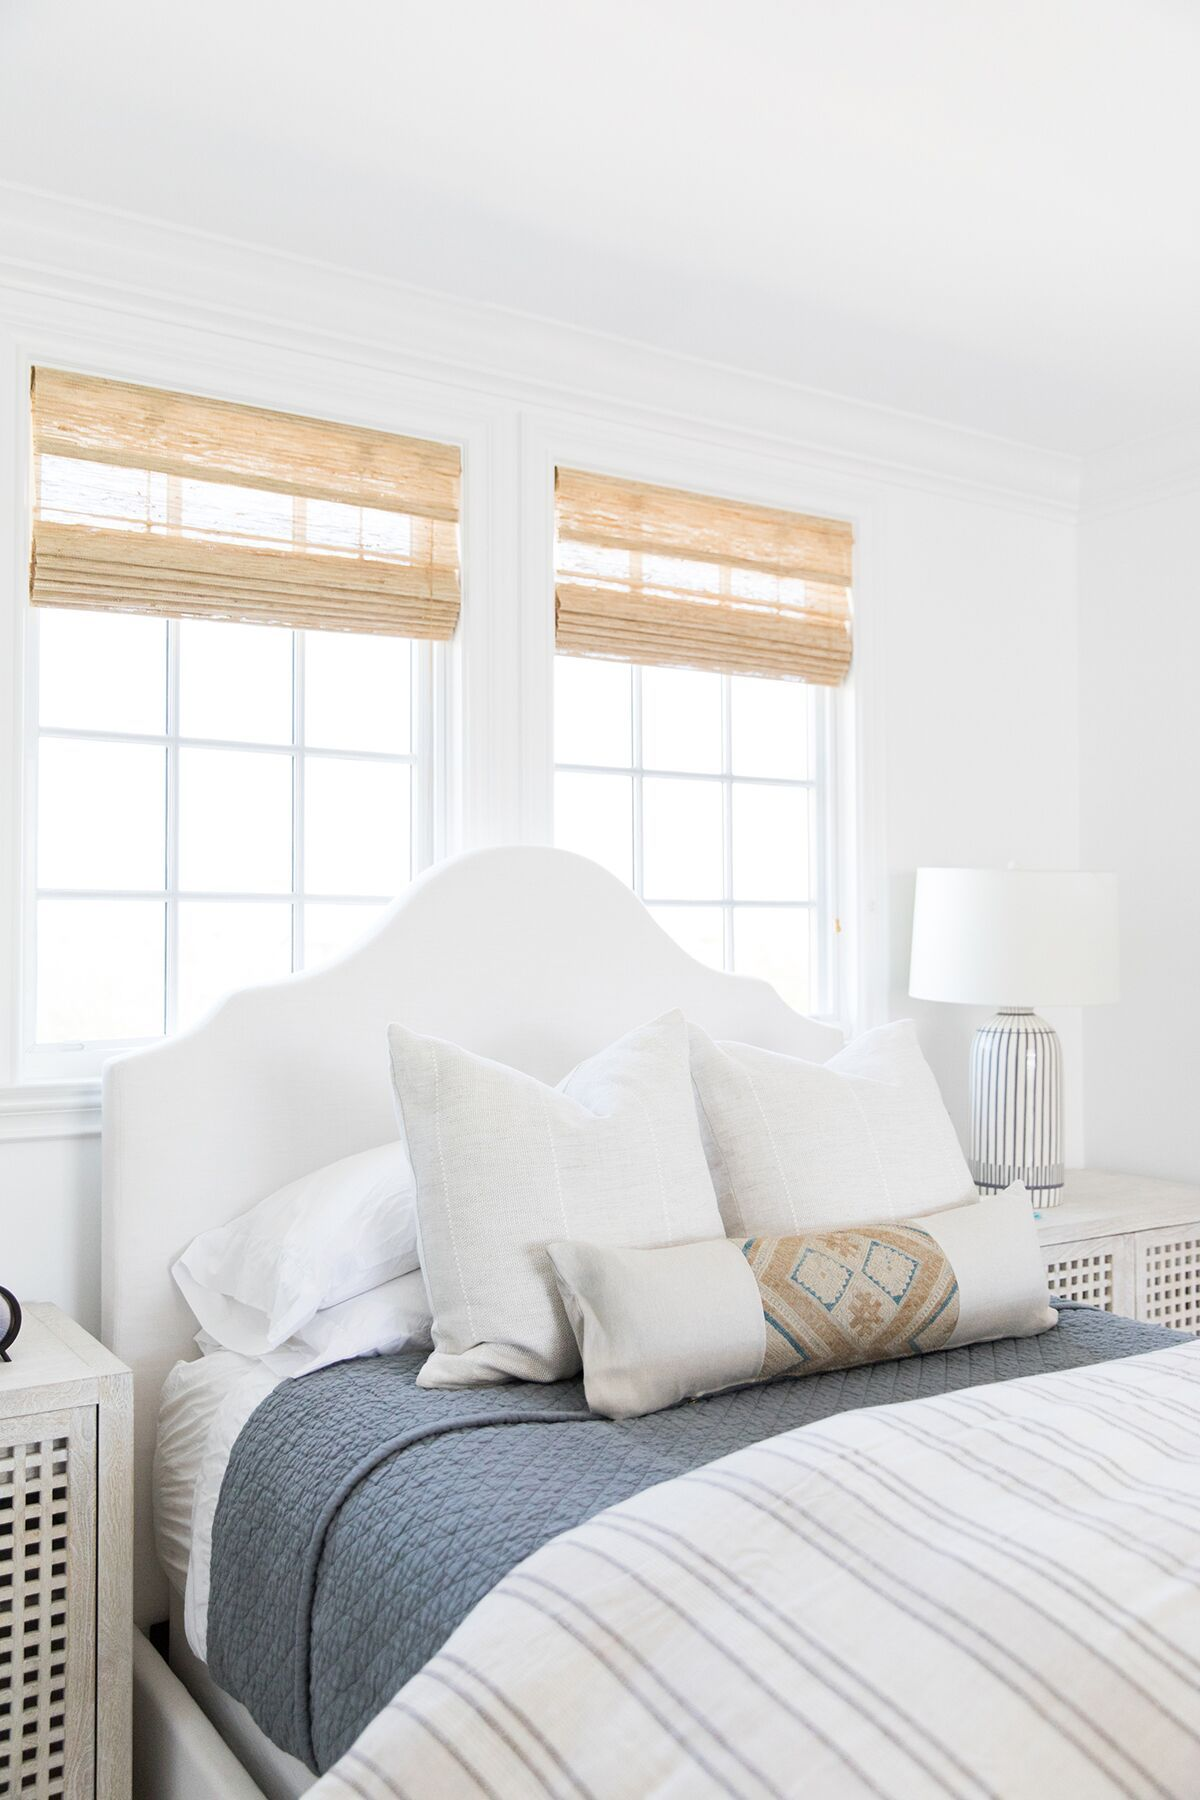 Outdoor Casita Lounge Bedroom - Light, Airy, Casita Design Inspiration